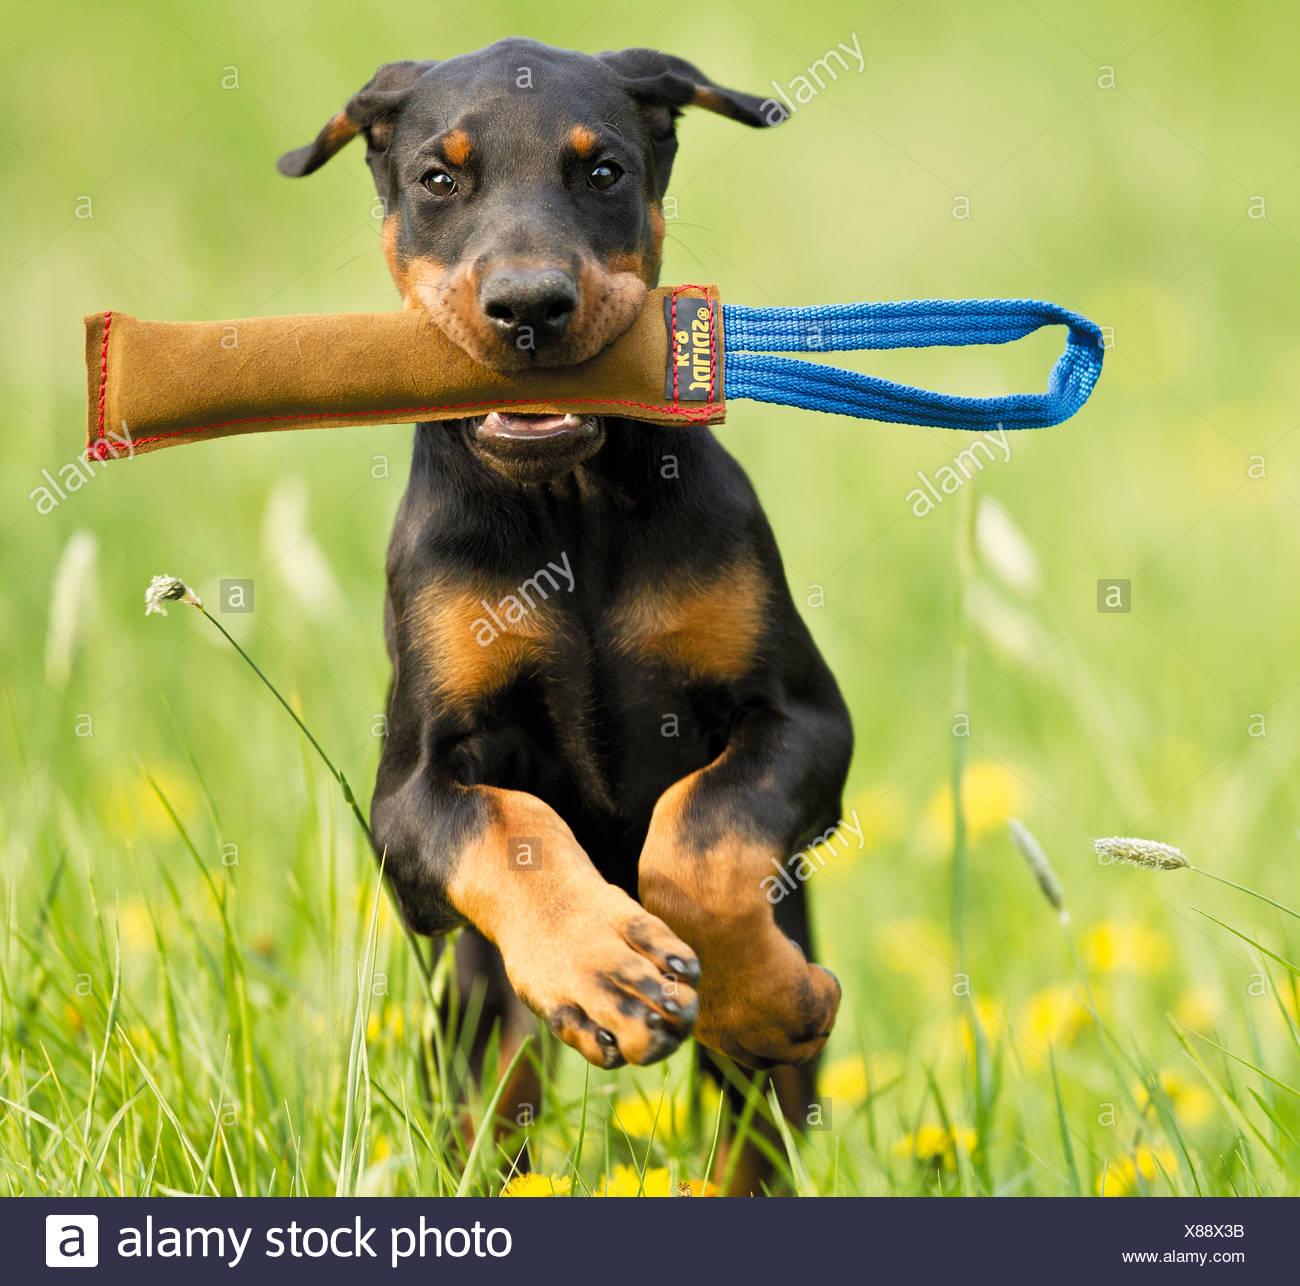 Doberman Pinscher Dog Puppy With Toy Stock Photo 280479231 Alamy